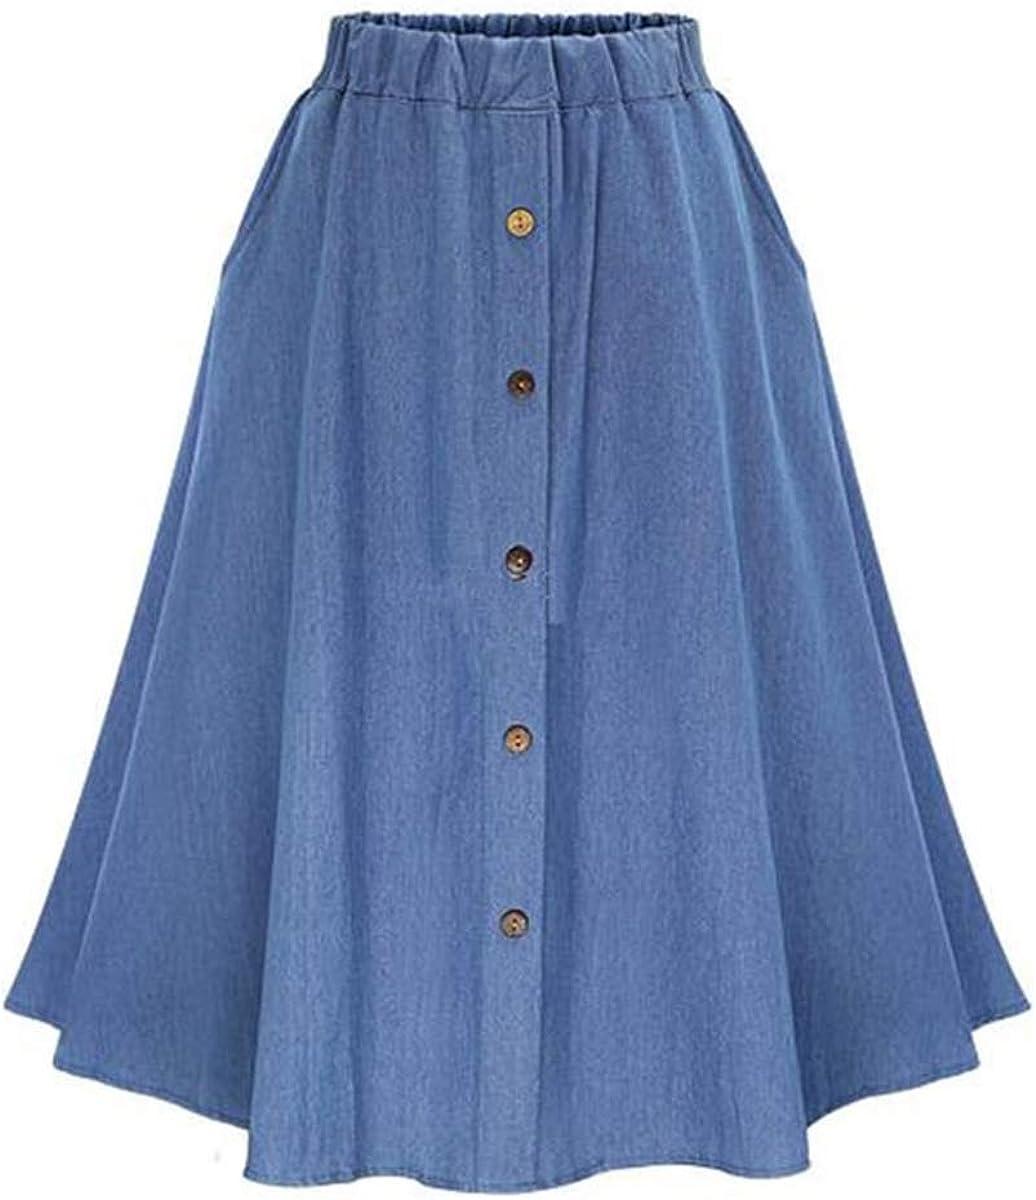 MakeMeChic Women's Casual Ruffle Hem Stretchy Waist Drawstring Maxi Flared A Line Skirt